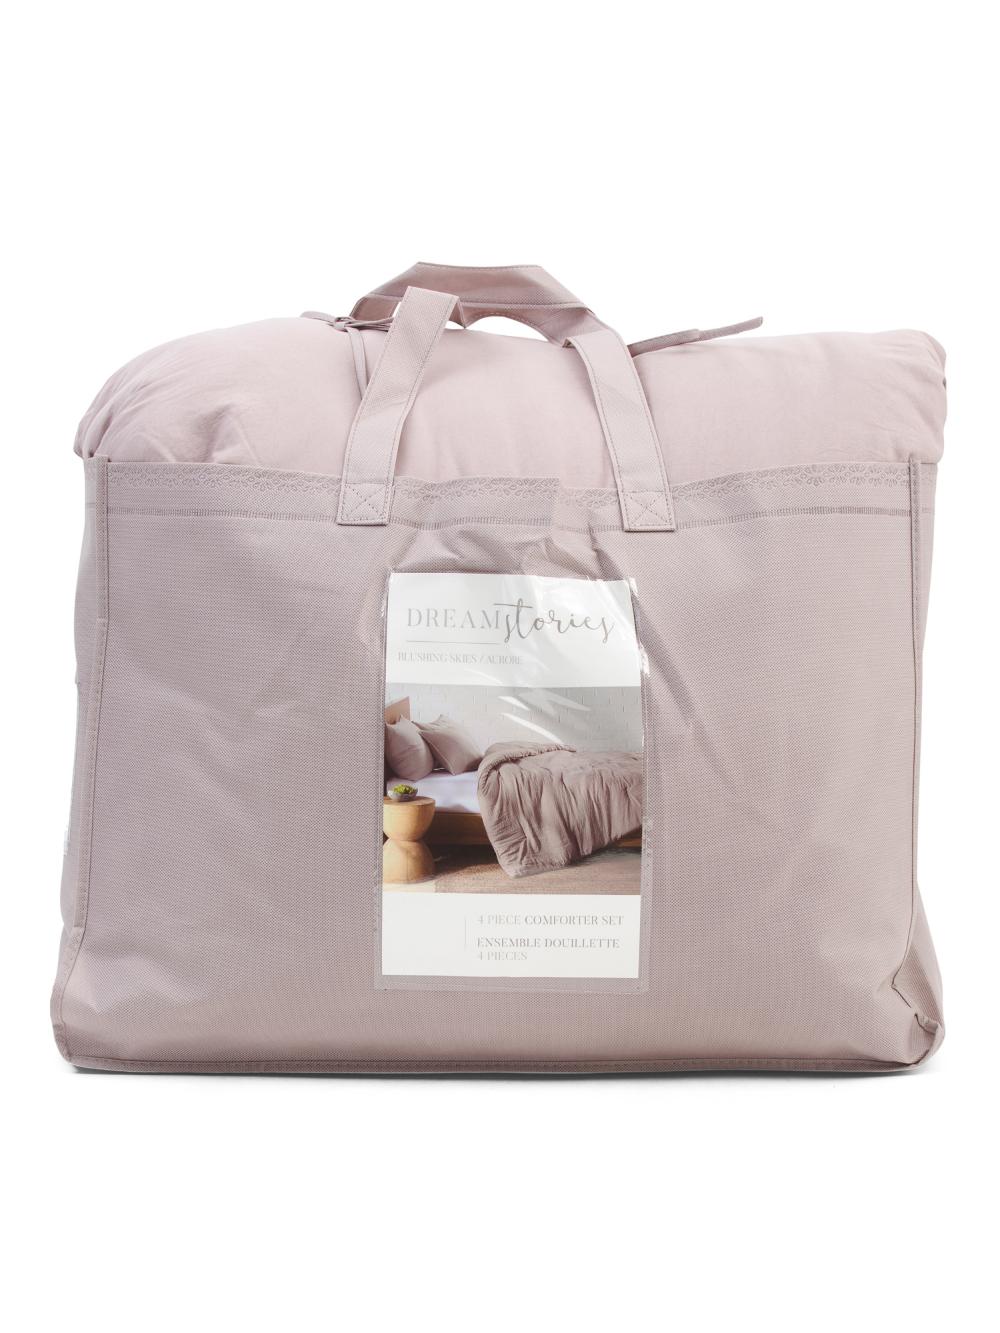 Maven Comforter Set : maven, comforter, Maven, Comforter, Bedroom, Marshalls, Sets,, Comforters,